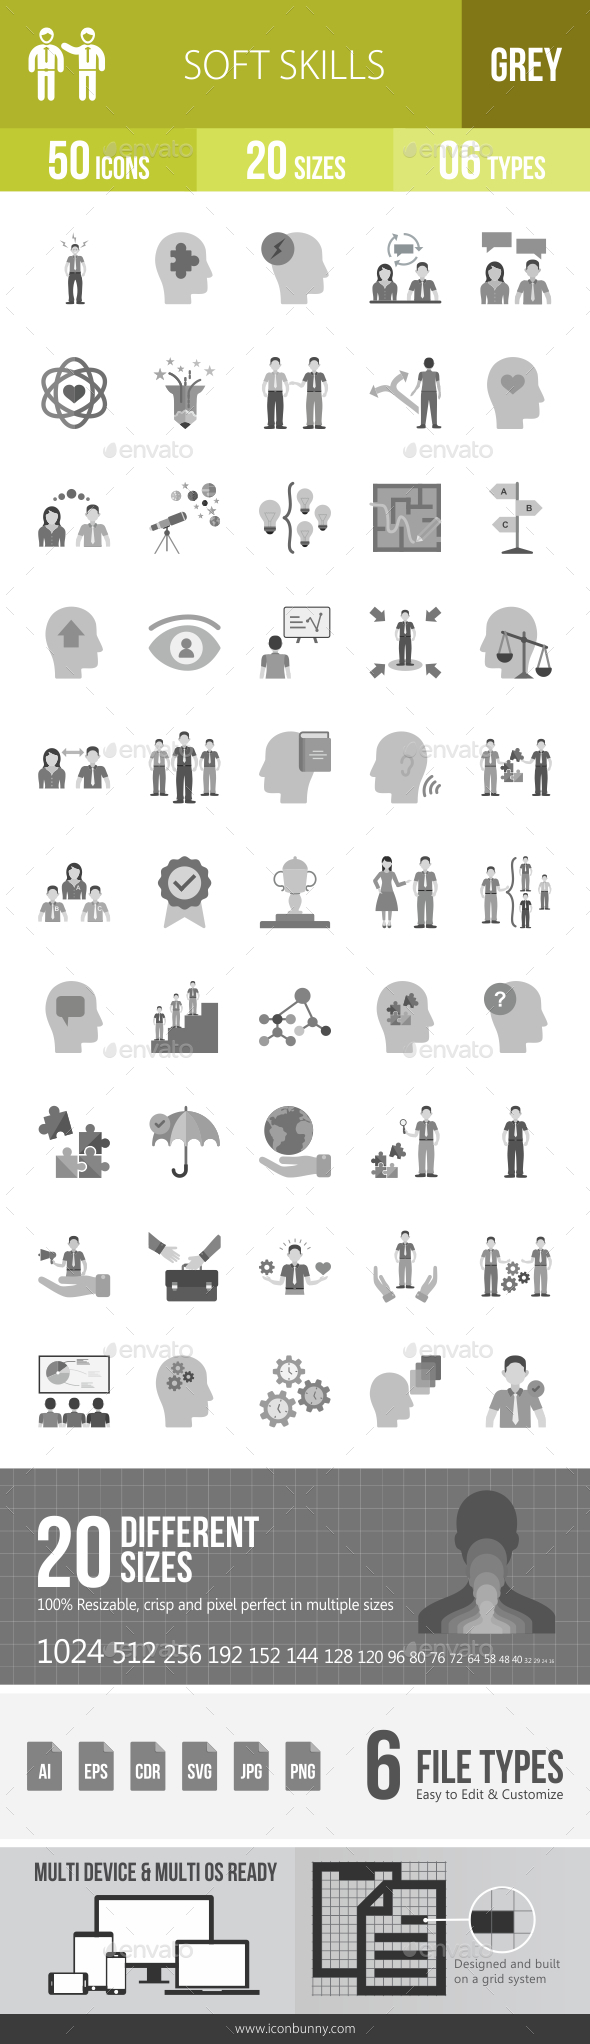 Soft Skills Greyscale Icons - Icons